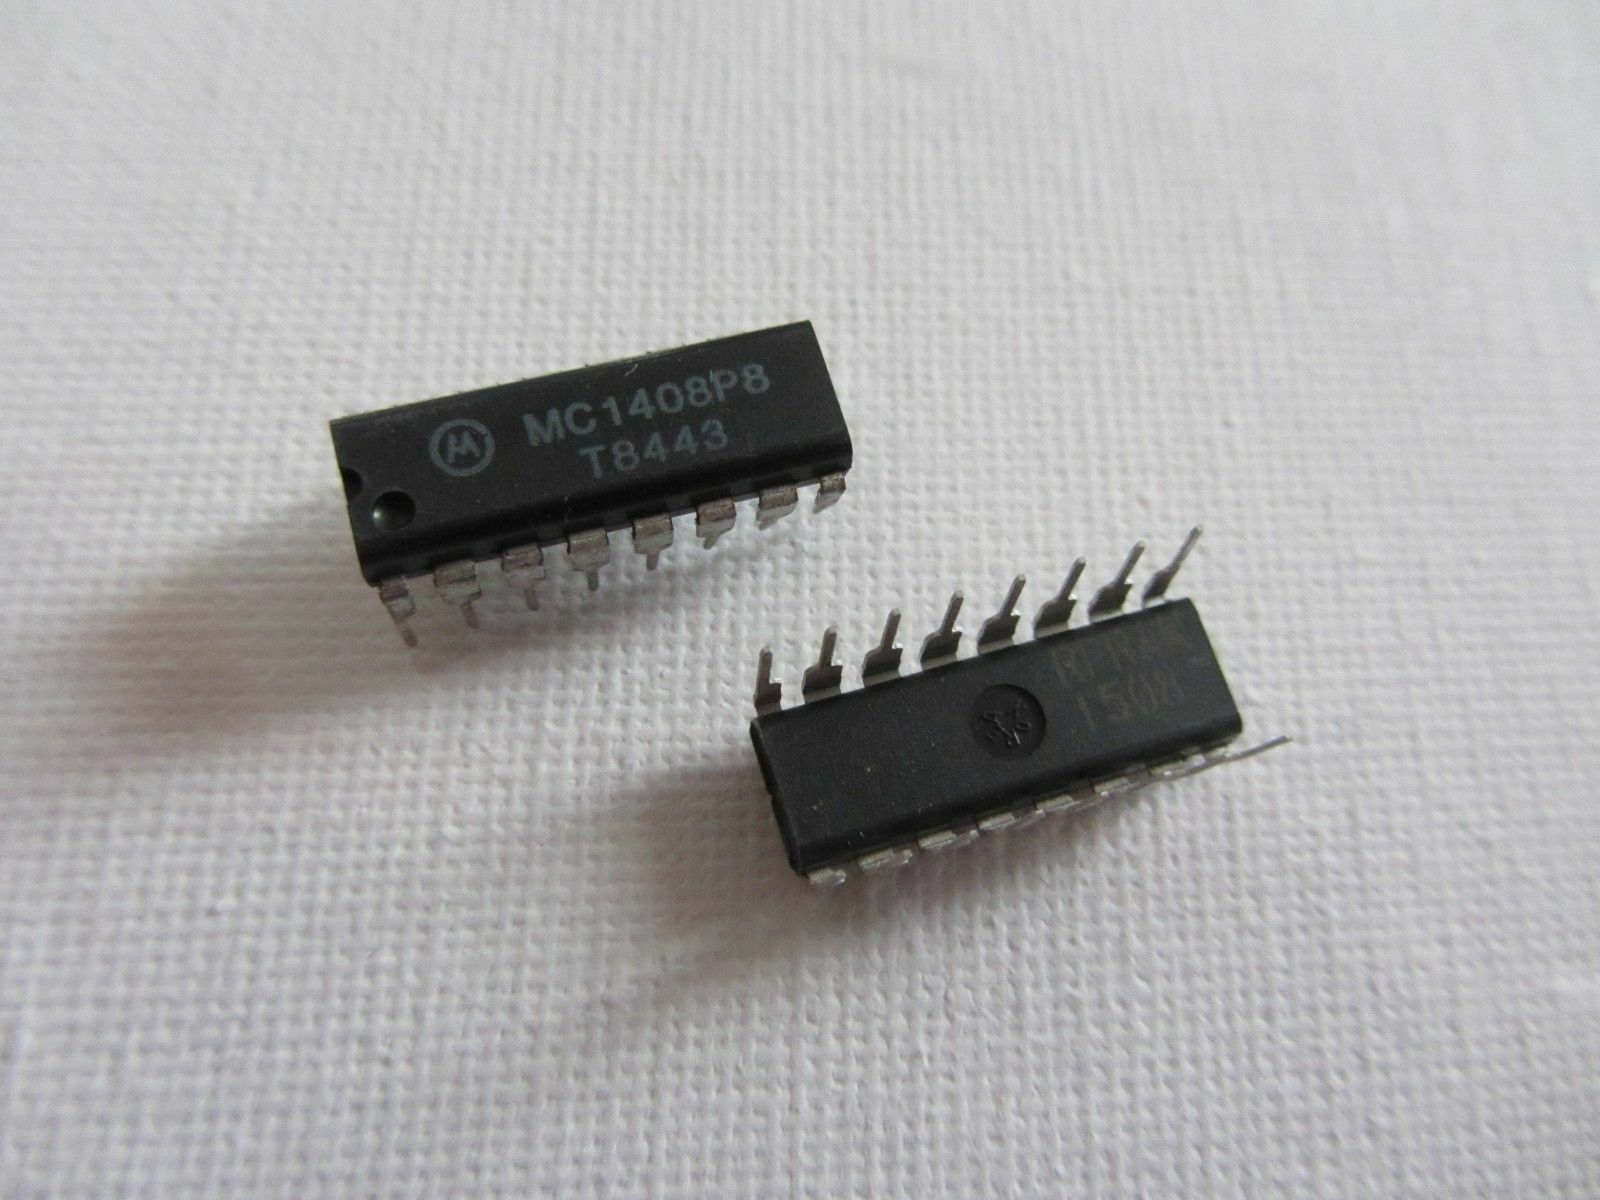 5 pezzi-Motorola mc1408l8-8-bit D//A Converter dic16 dac0808-5x